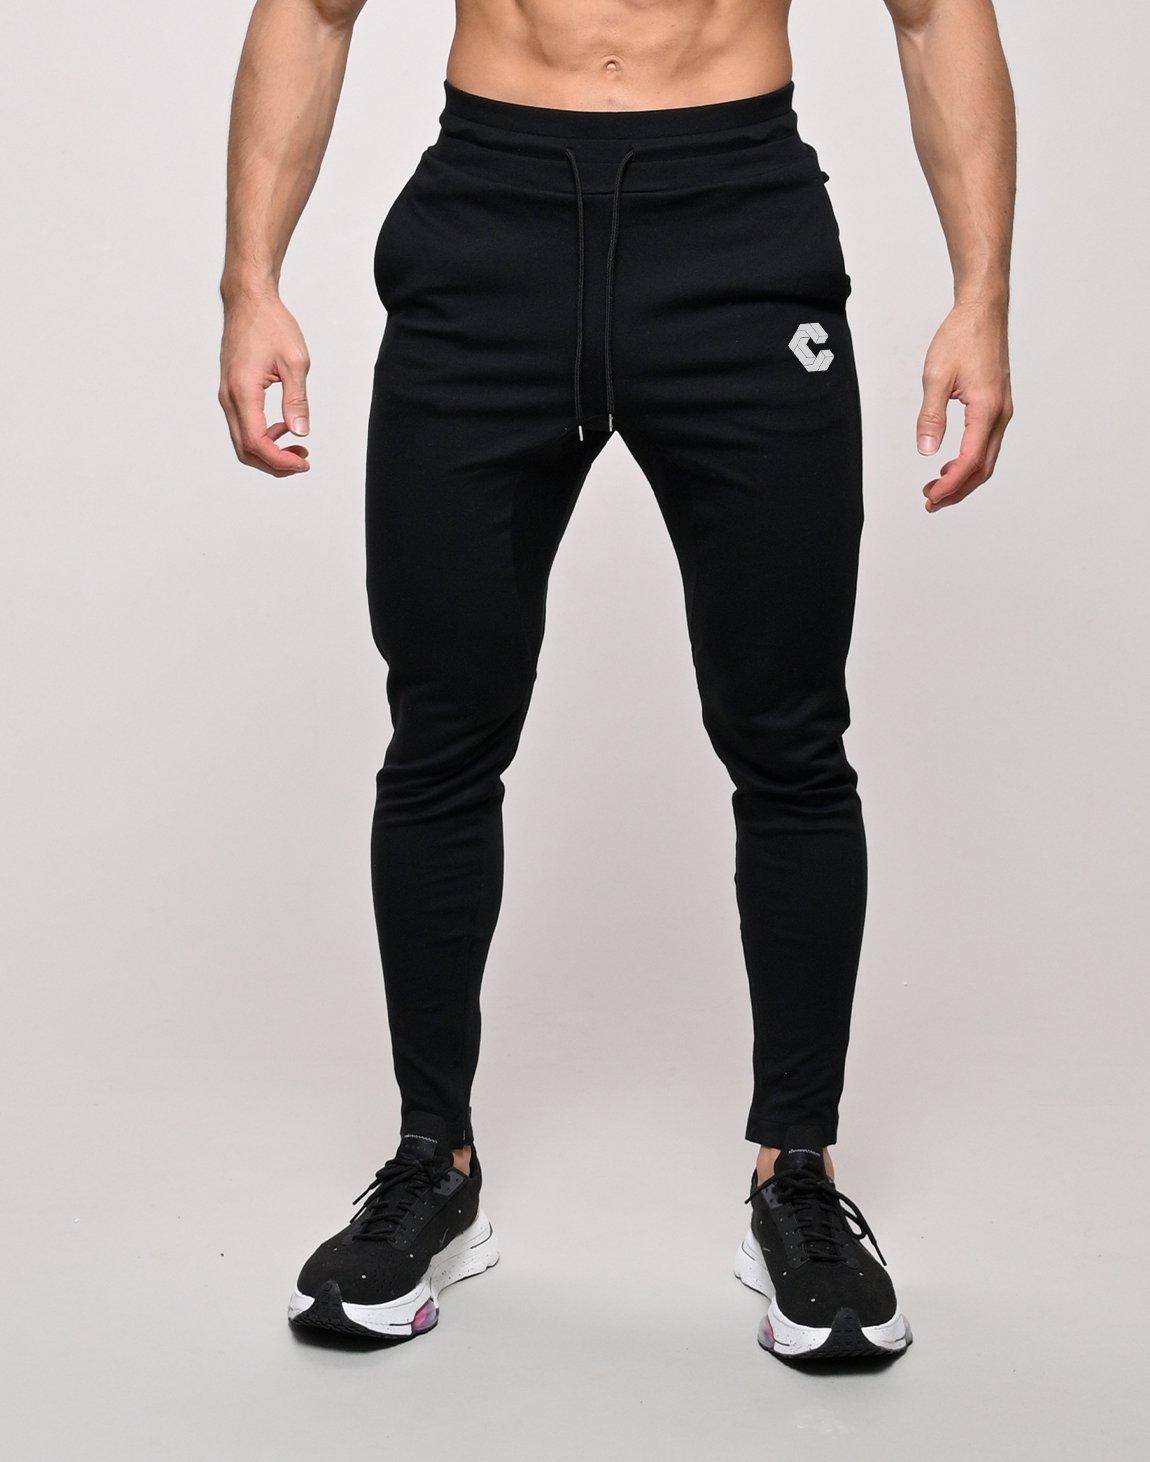 CRONOS NEW MODE PANTS【BLACK】